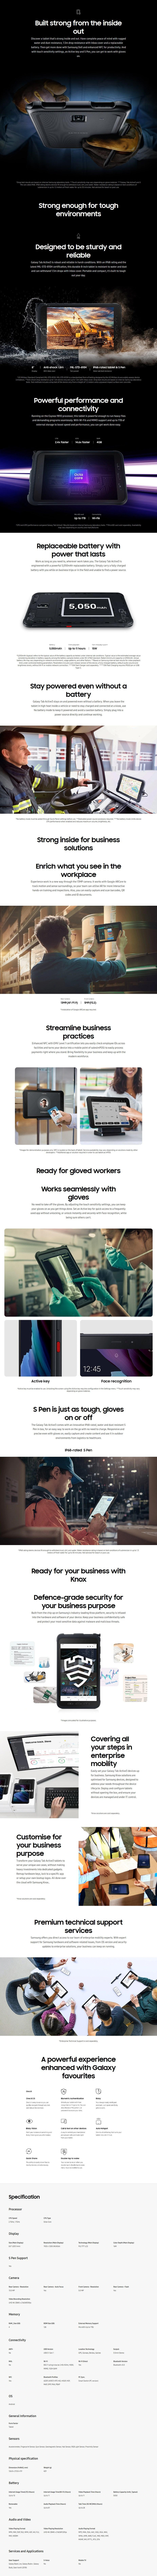 "Samsung Galaxy Tab Active 3 8"" 128GB Wi-Fi - Black - Overview 1"